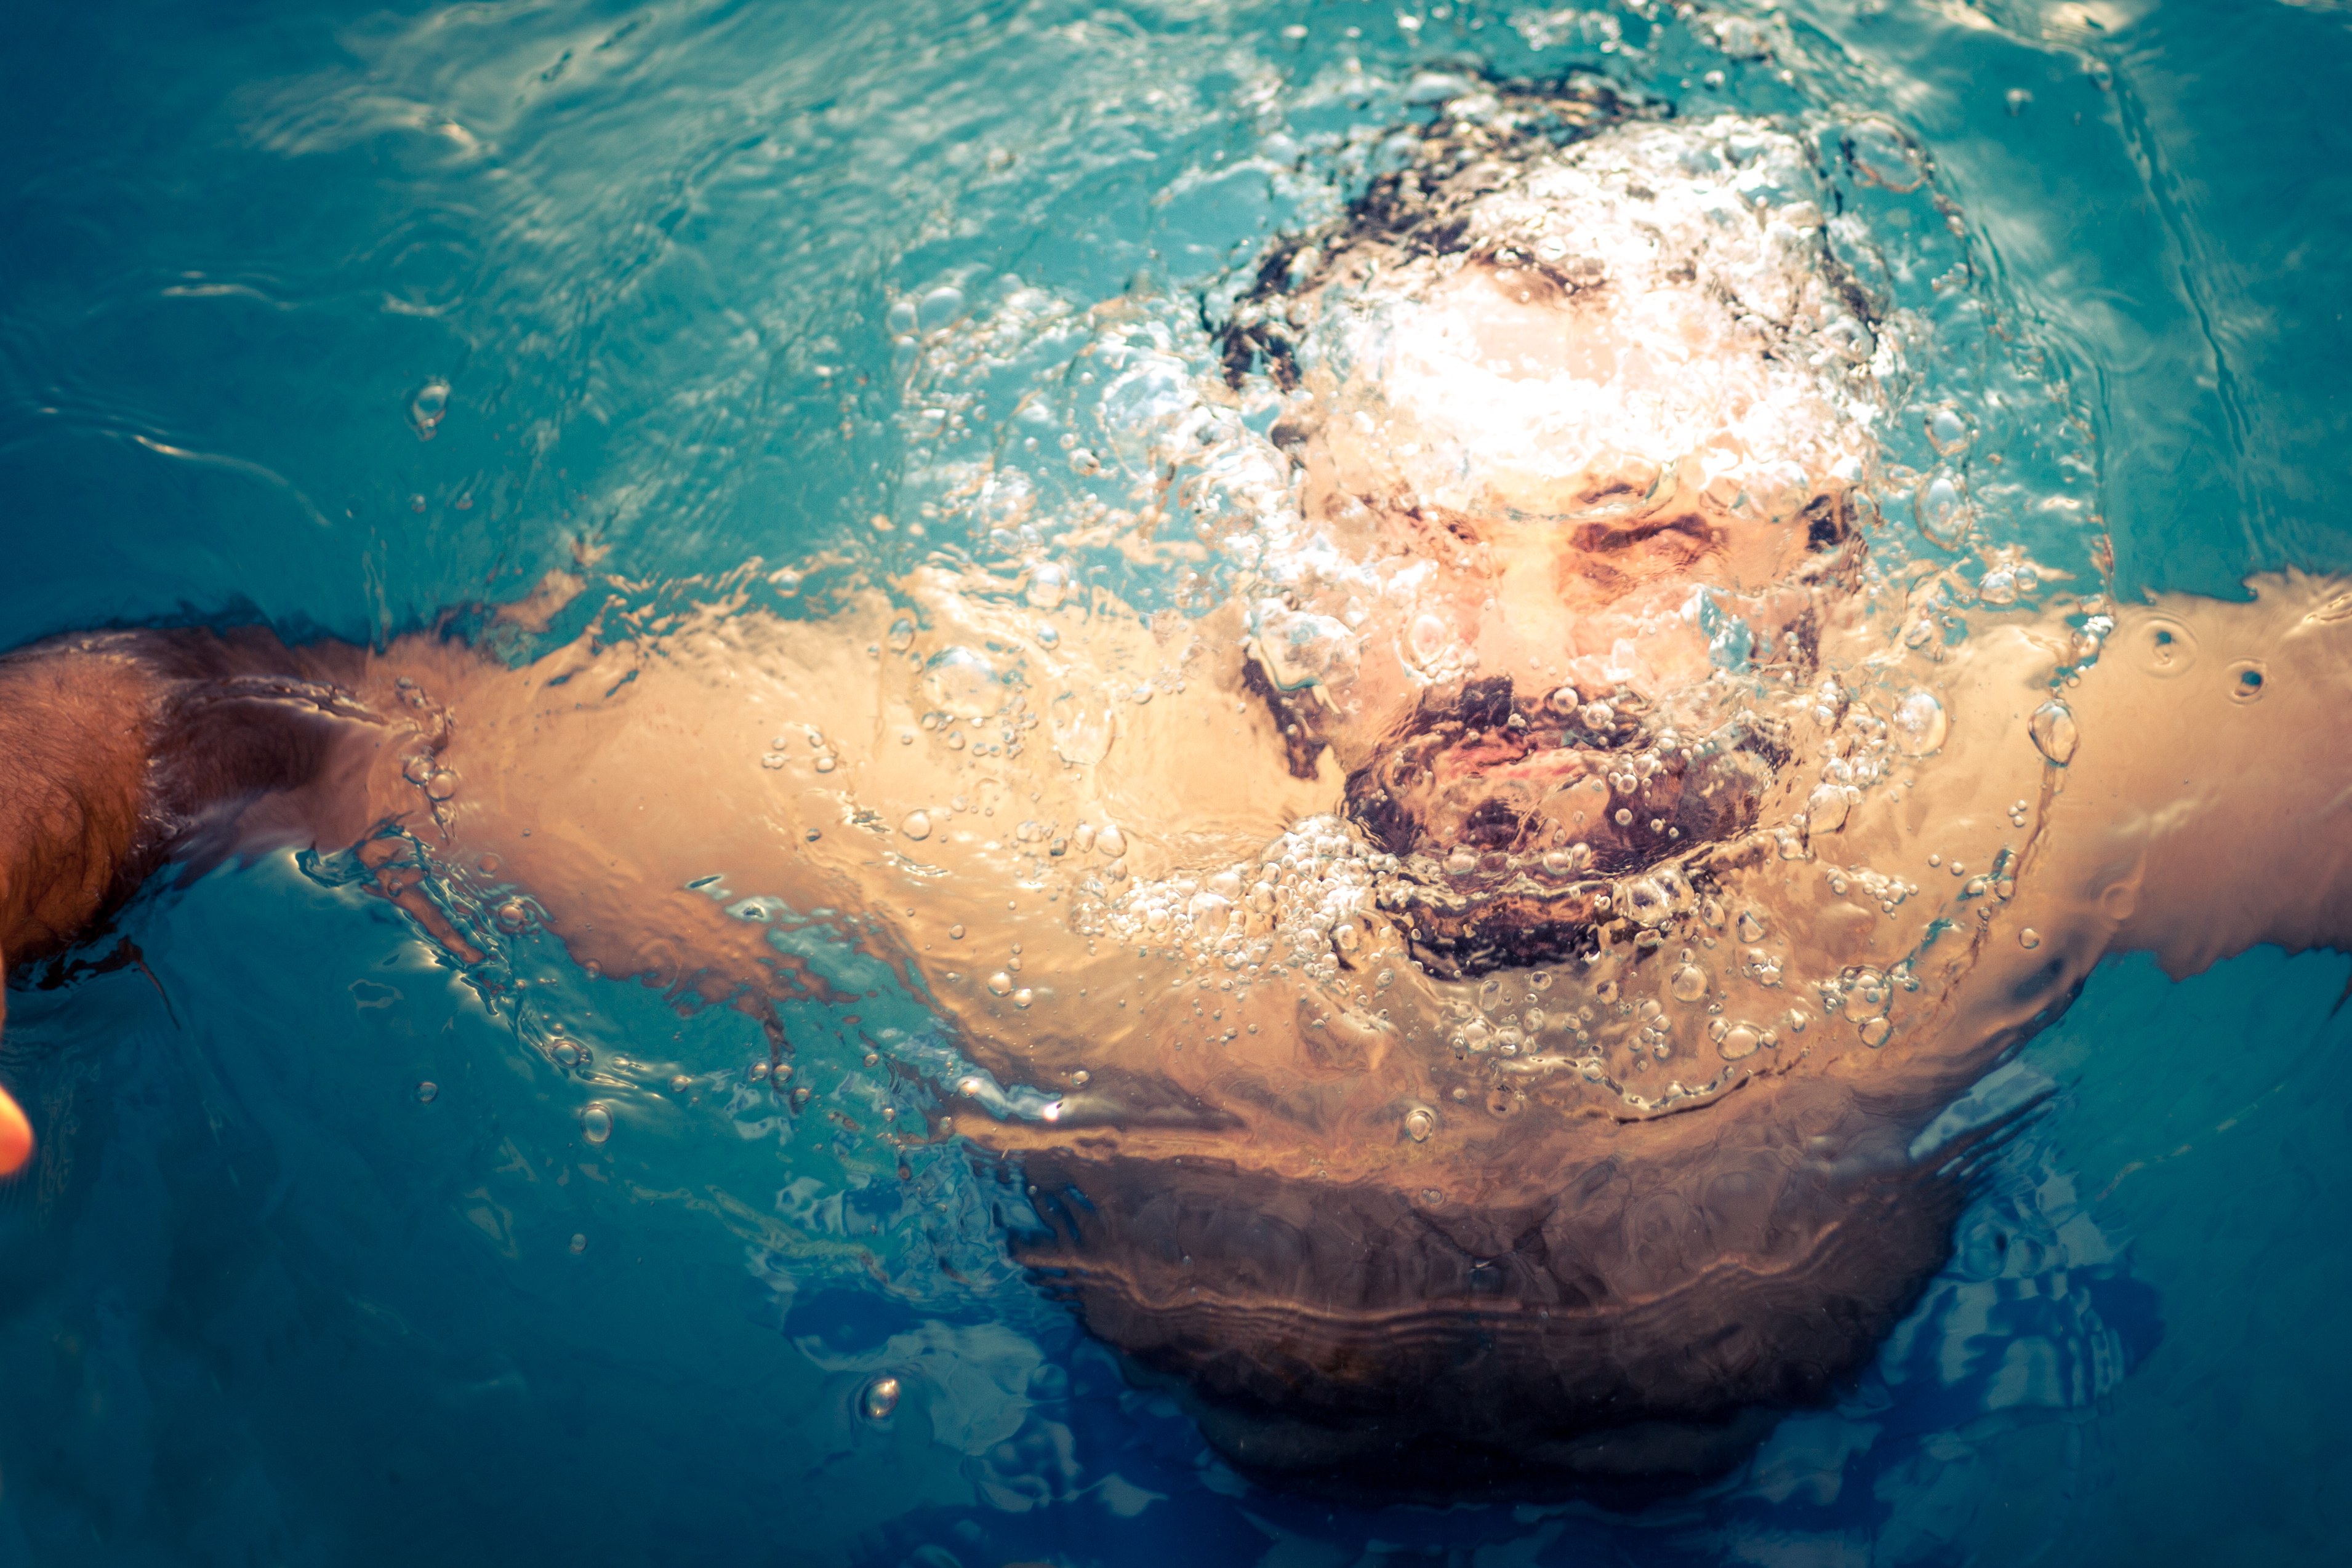 hearing underwater